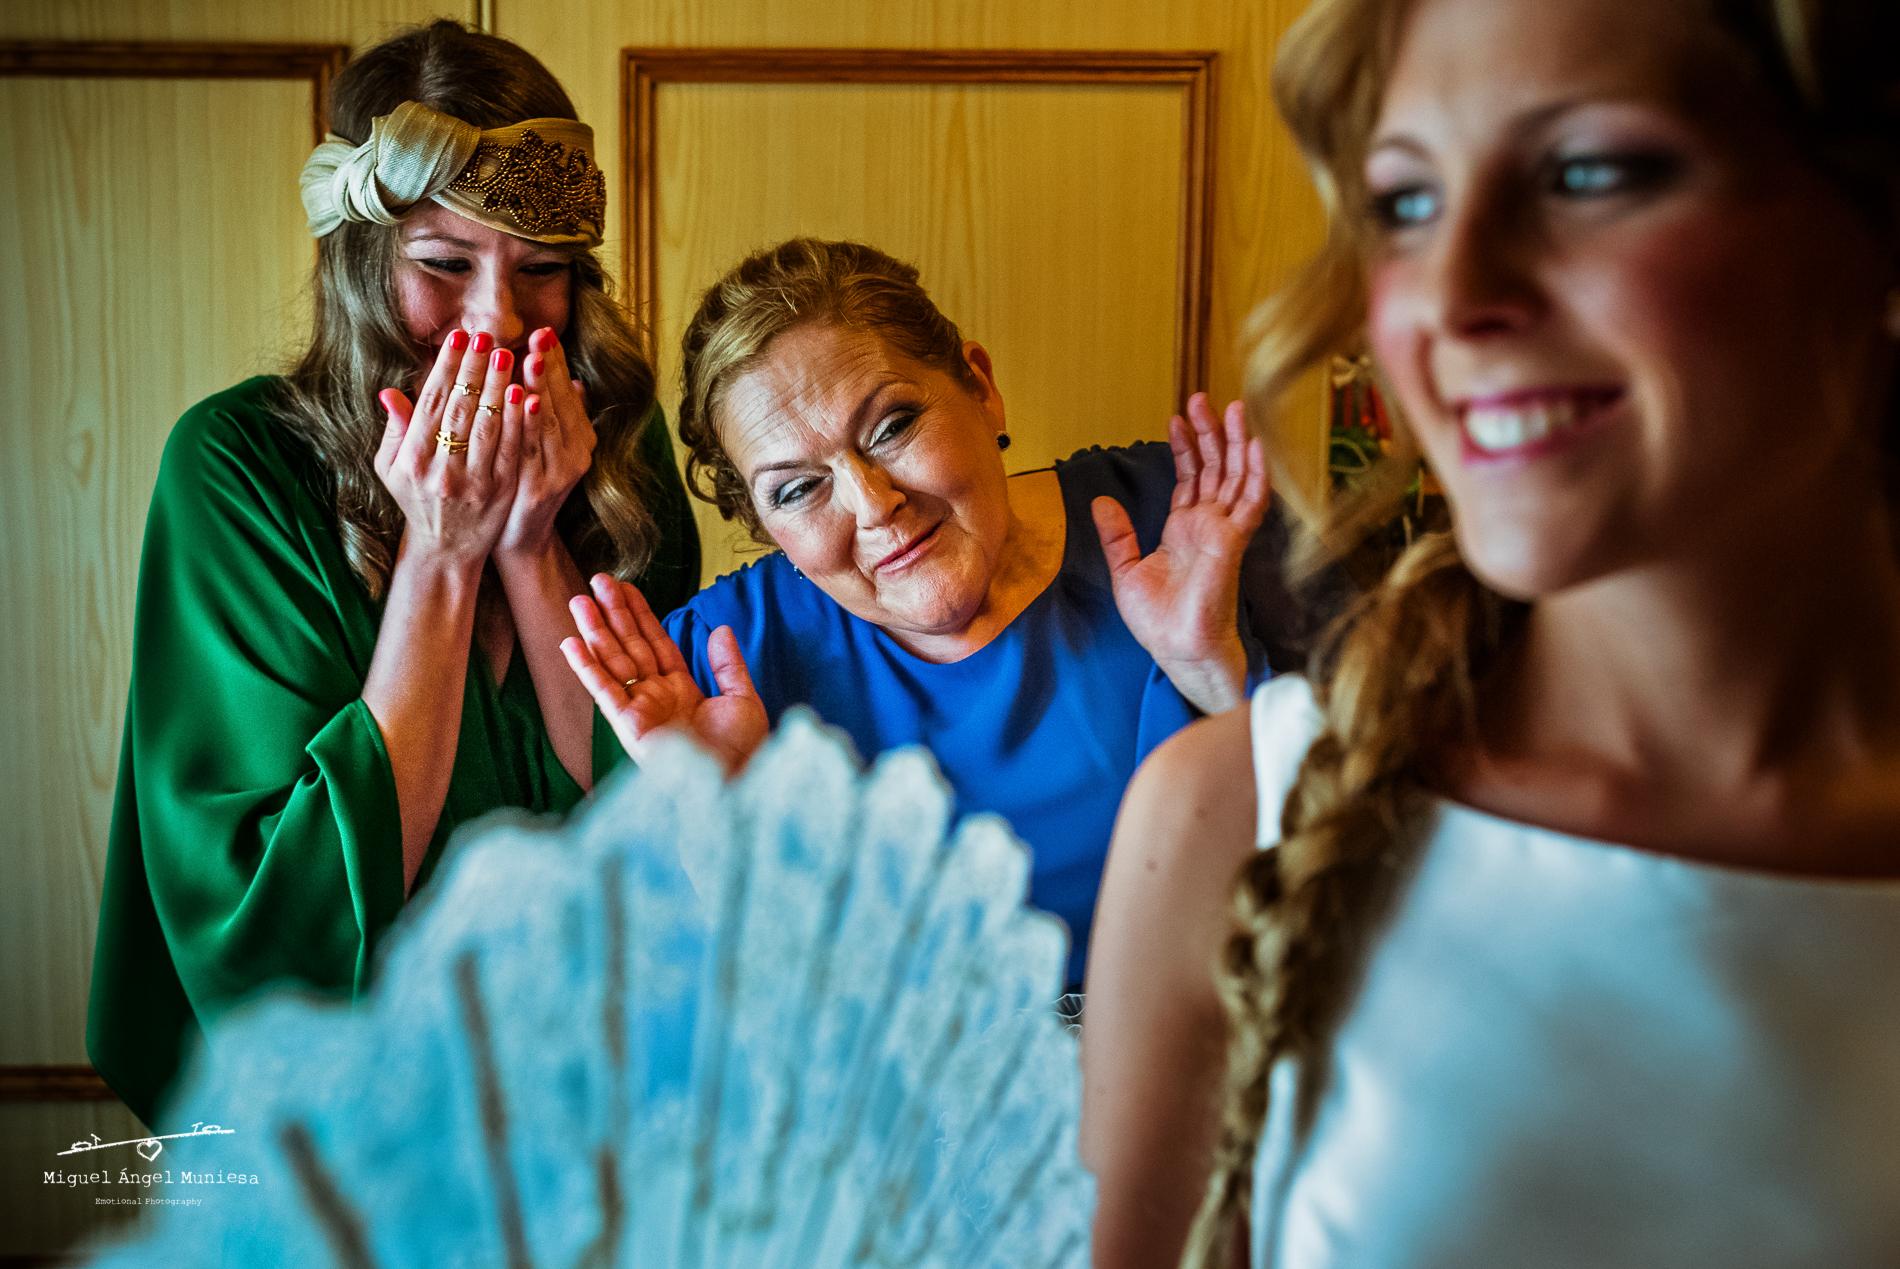 boda, fotografia de boda, boda zaragoza, fotografia, wedding, wedding photography, miguel angel muniesa, fotografo boda Zaragoza, fotografo boda, destination wedding_ 011